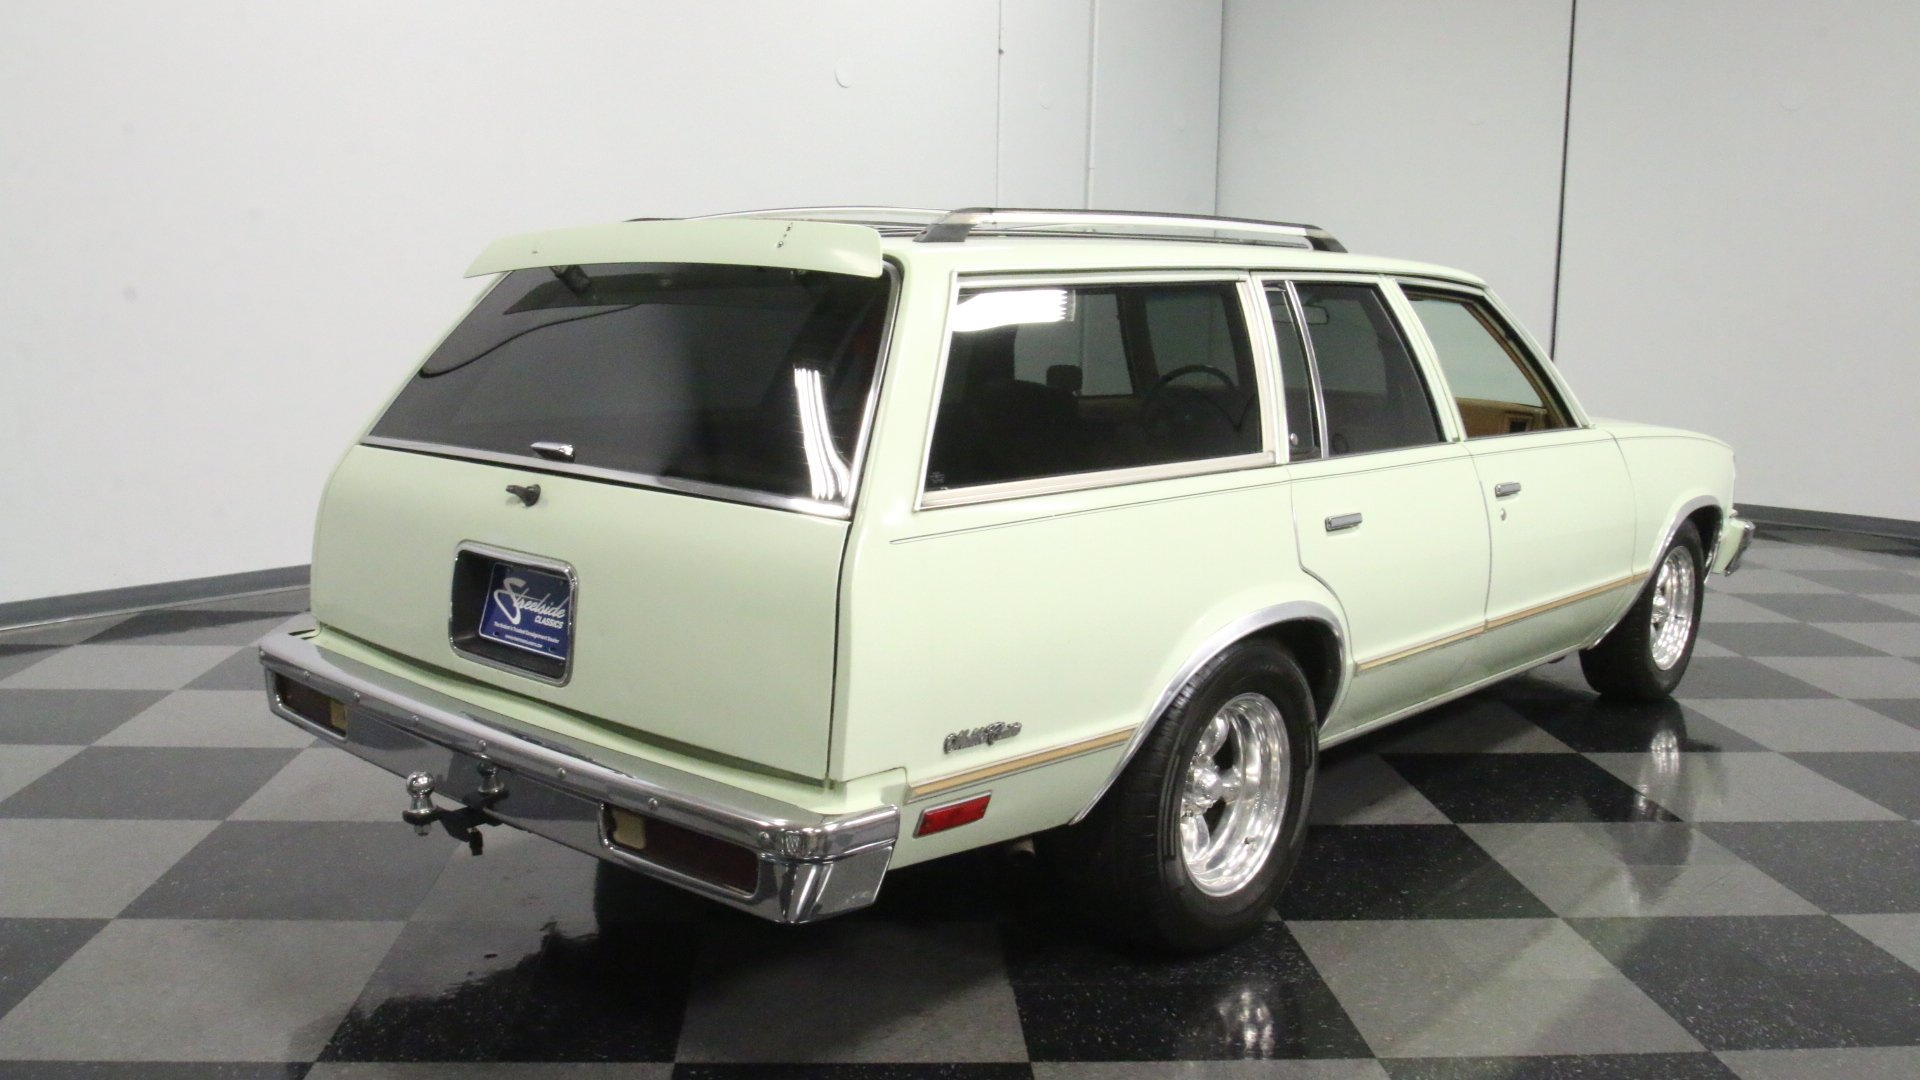 1979 Chevrolet Malibu | Streetside Classics - The Nation's Trusted